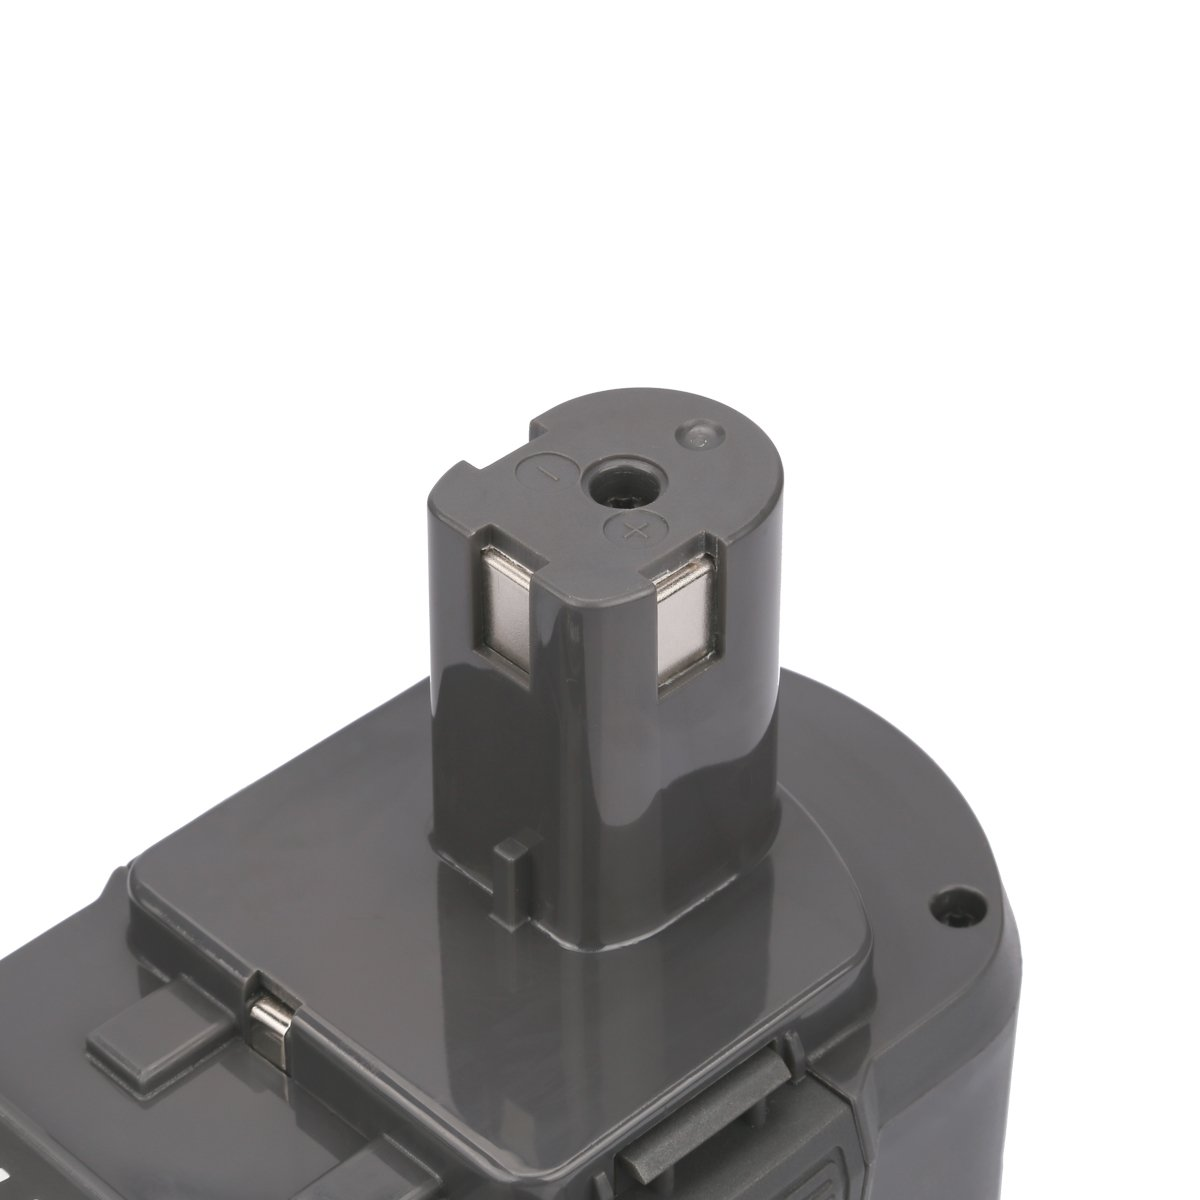 Energup P108 4000mAh Ryobi 18V Lithium Battery Pack Replacement for Ryobi 18-Volt ONE+ P104 P105 P102 P103 P107 Tool